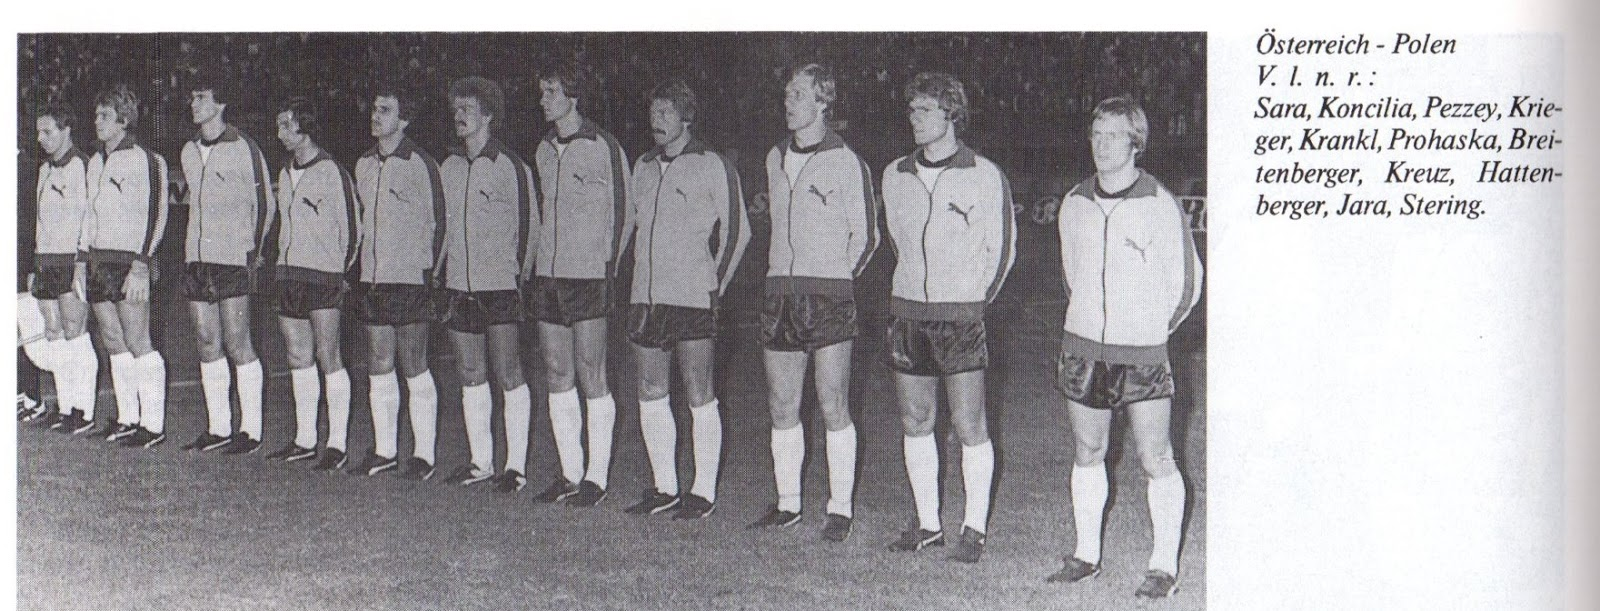 soccer nostalgia international season 1977 78, part 1  fu%c3%83%c2%9fball torwart c 8 #9